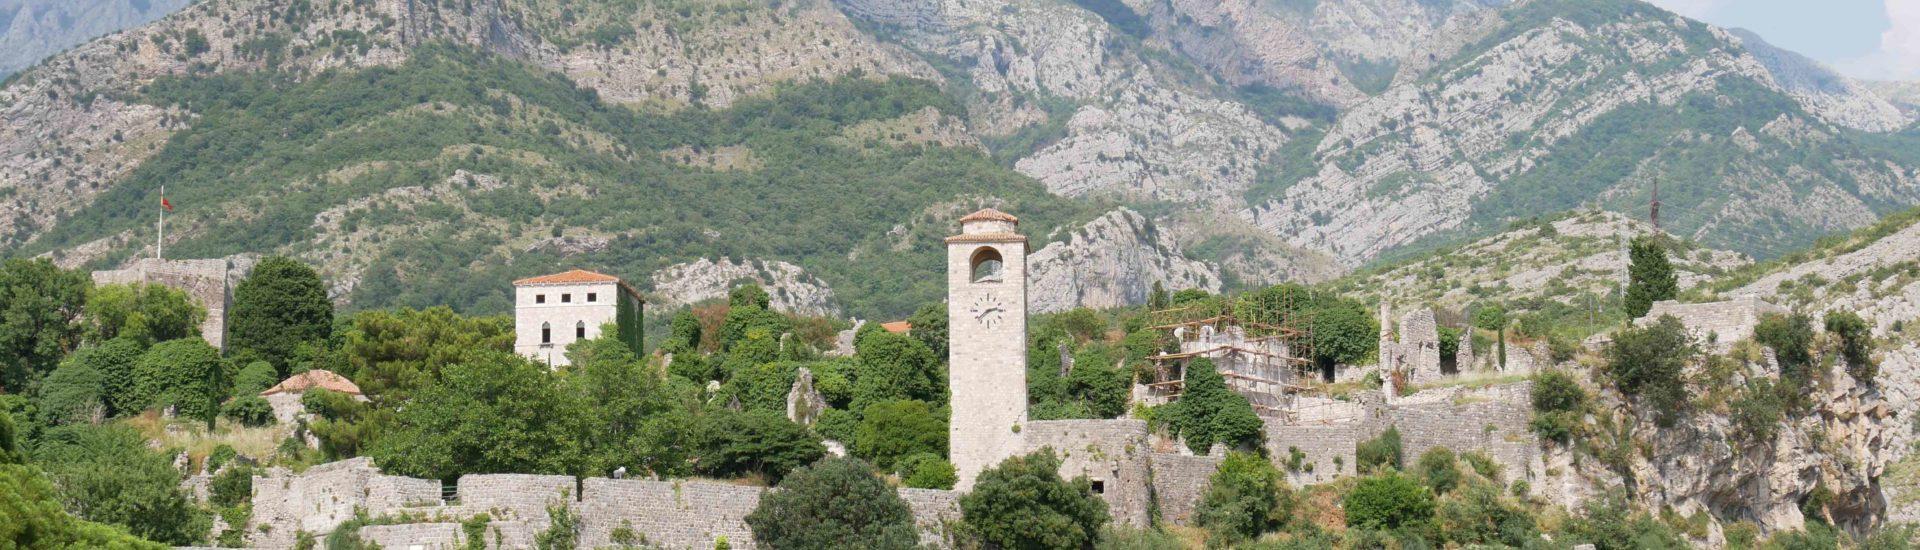 road trip montenegro 2 semaines blog voyage